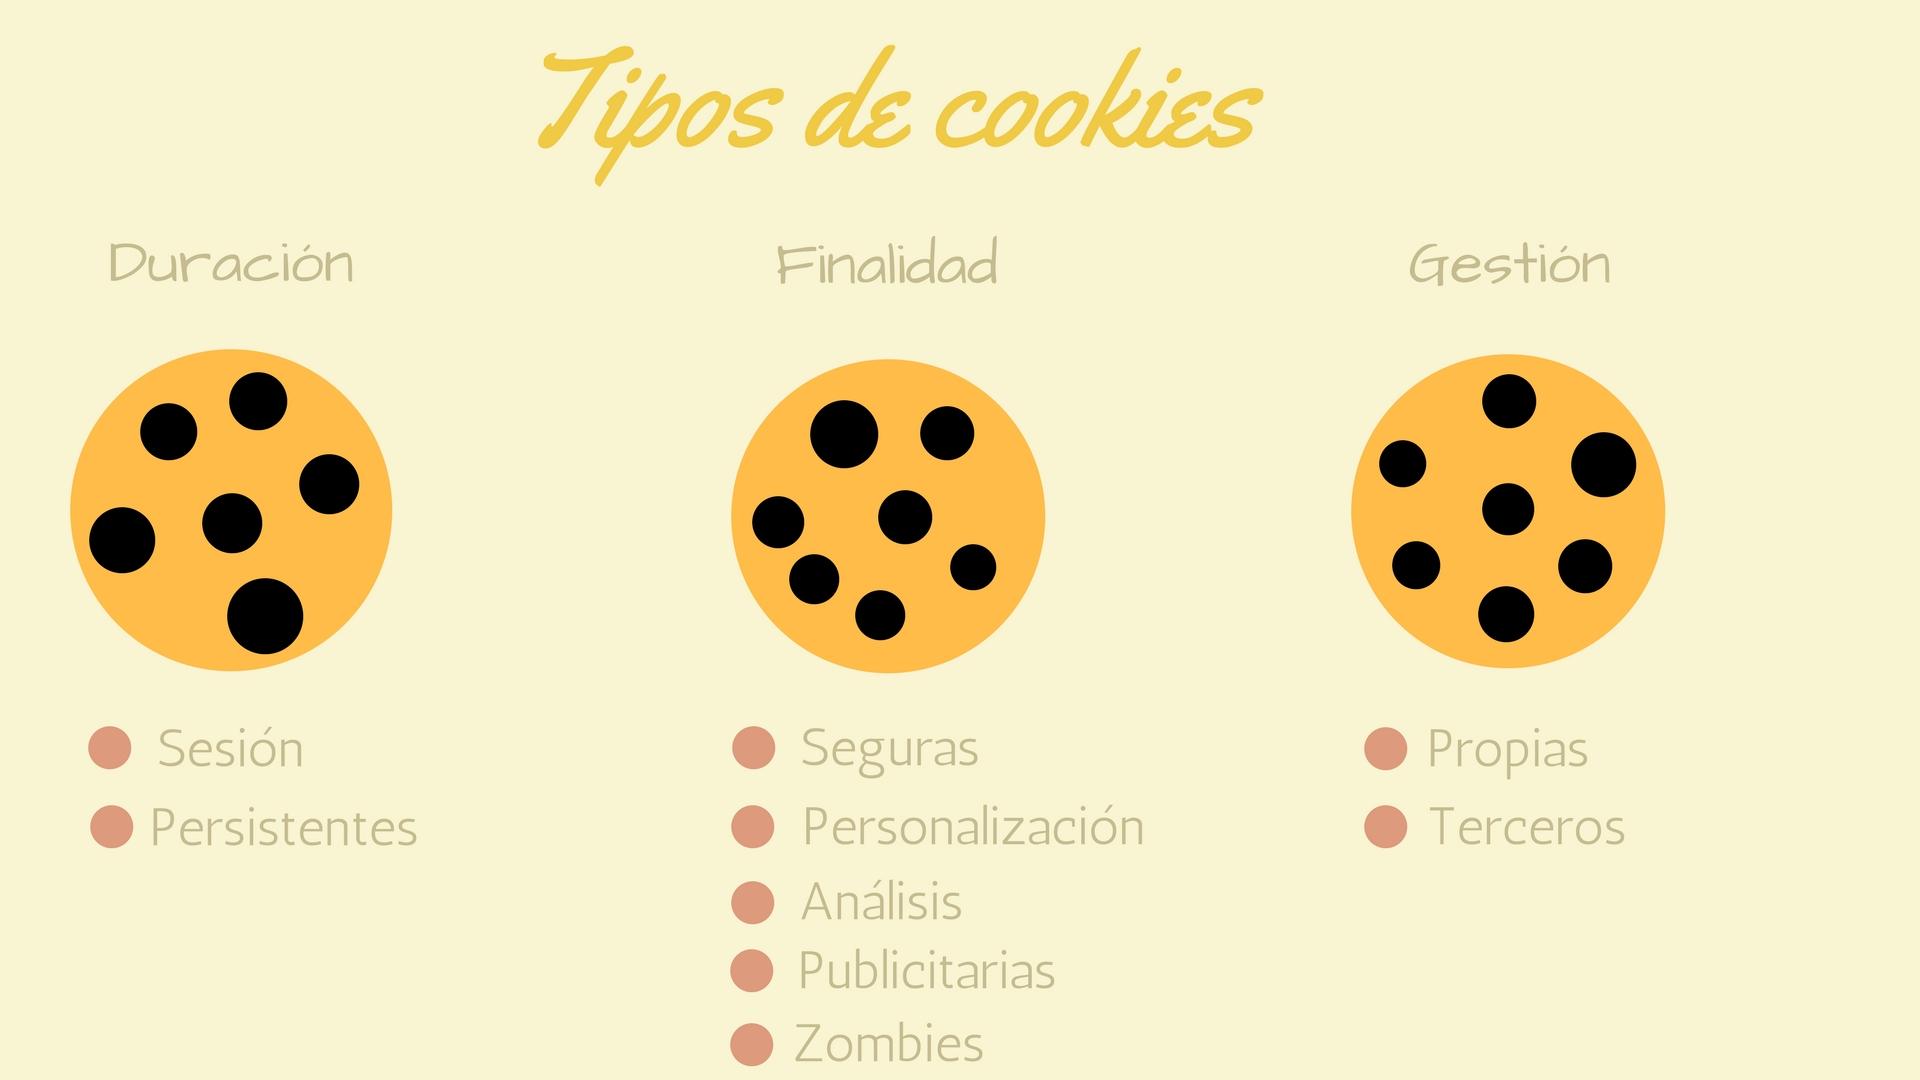 Diferentes tipos de cookies que existen